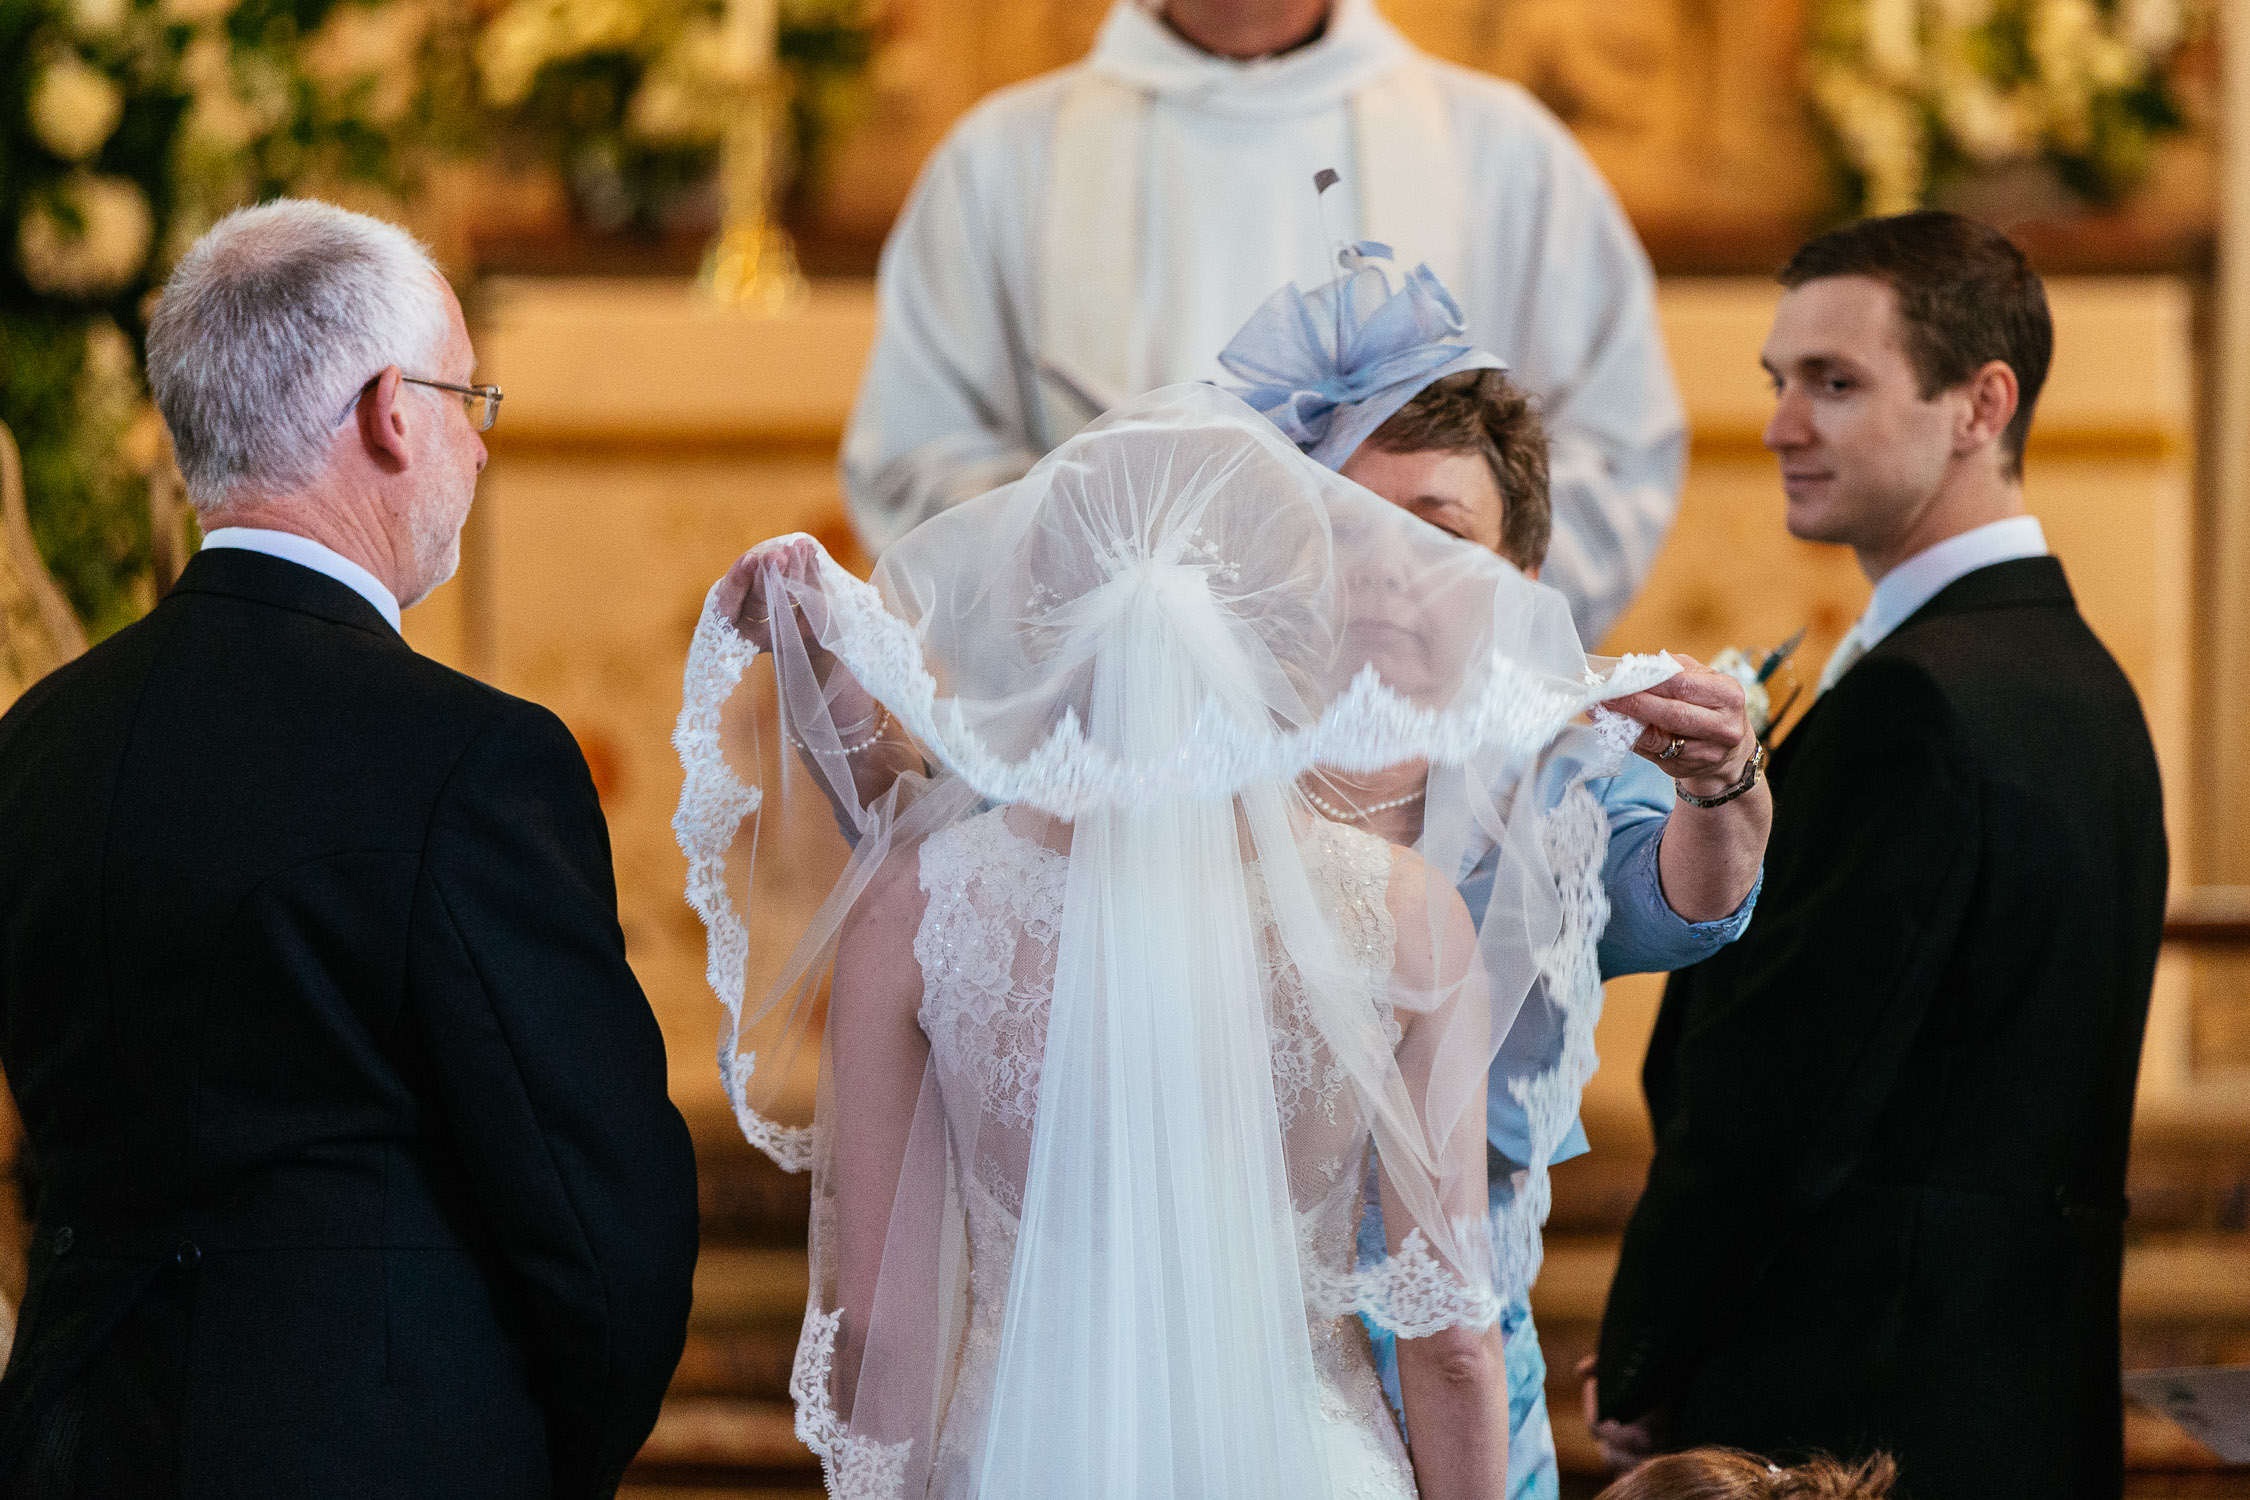 Lizi-and-Mark-Wedding-Highlights-26.jpg